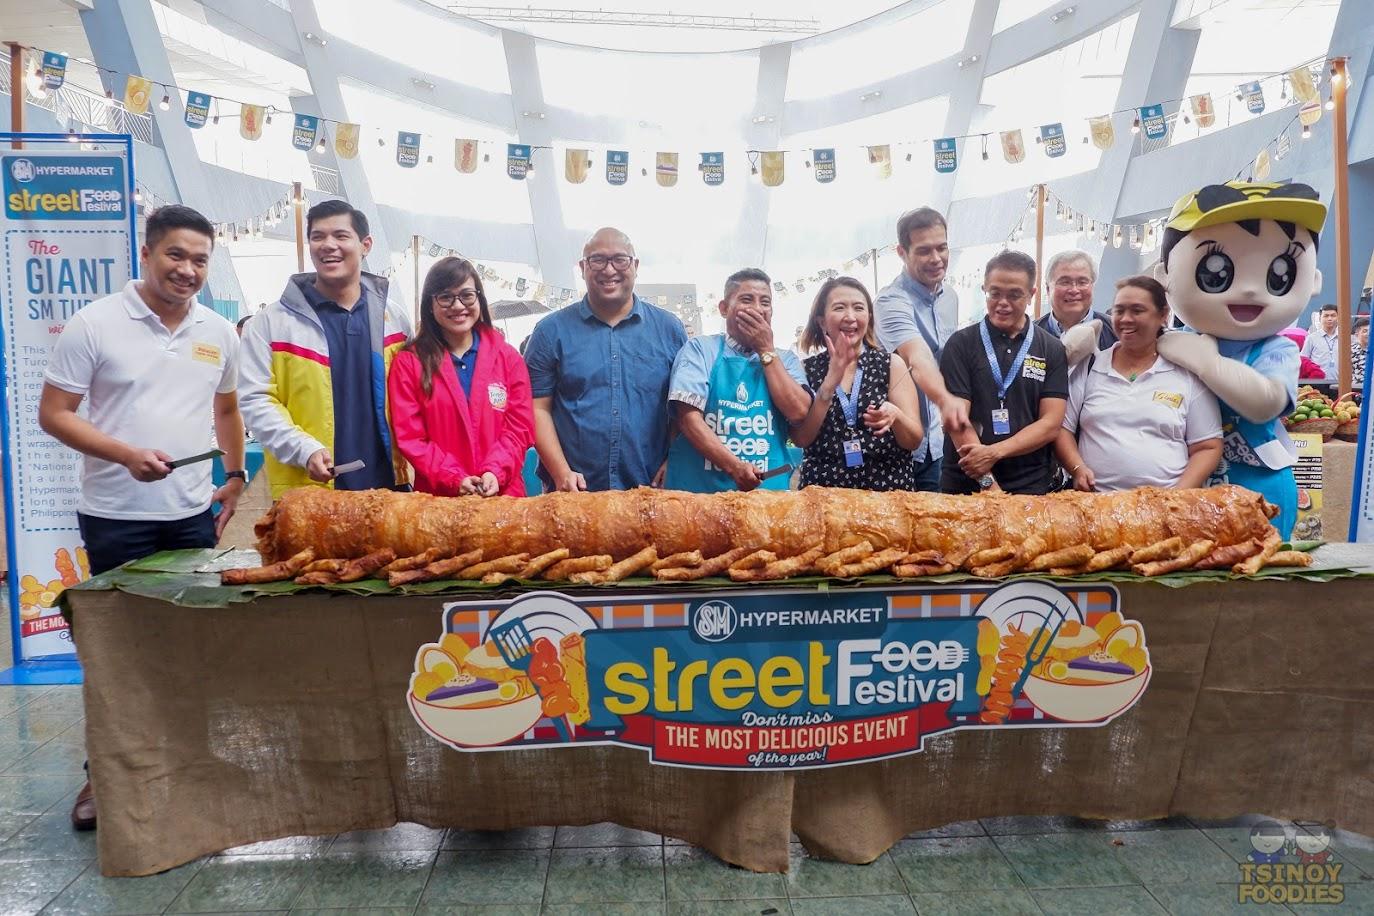 sm hypermarket street food festival 2019